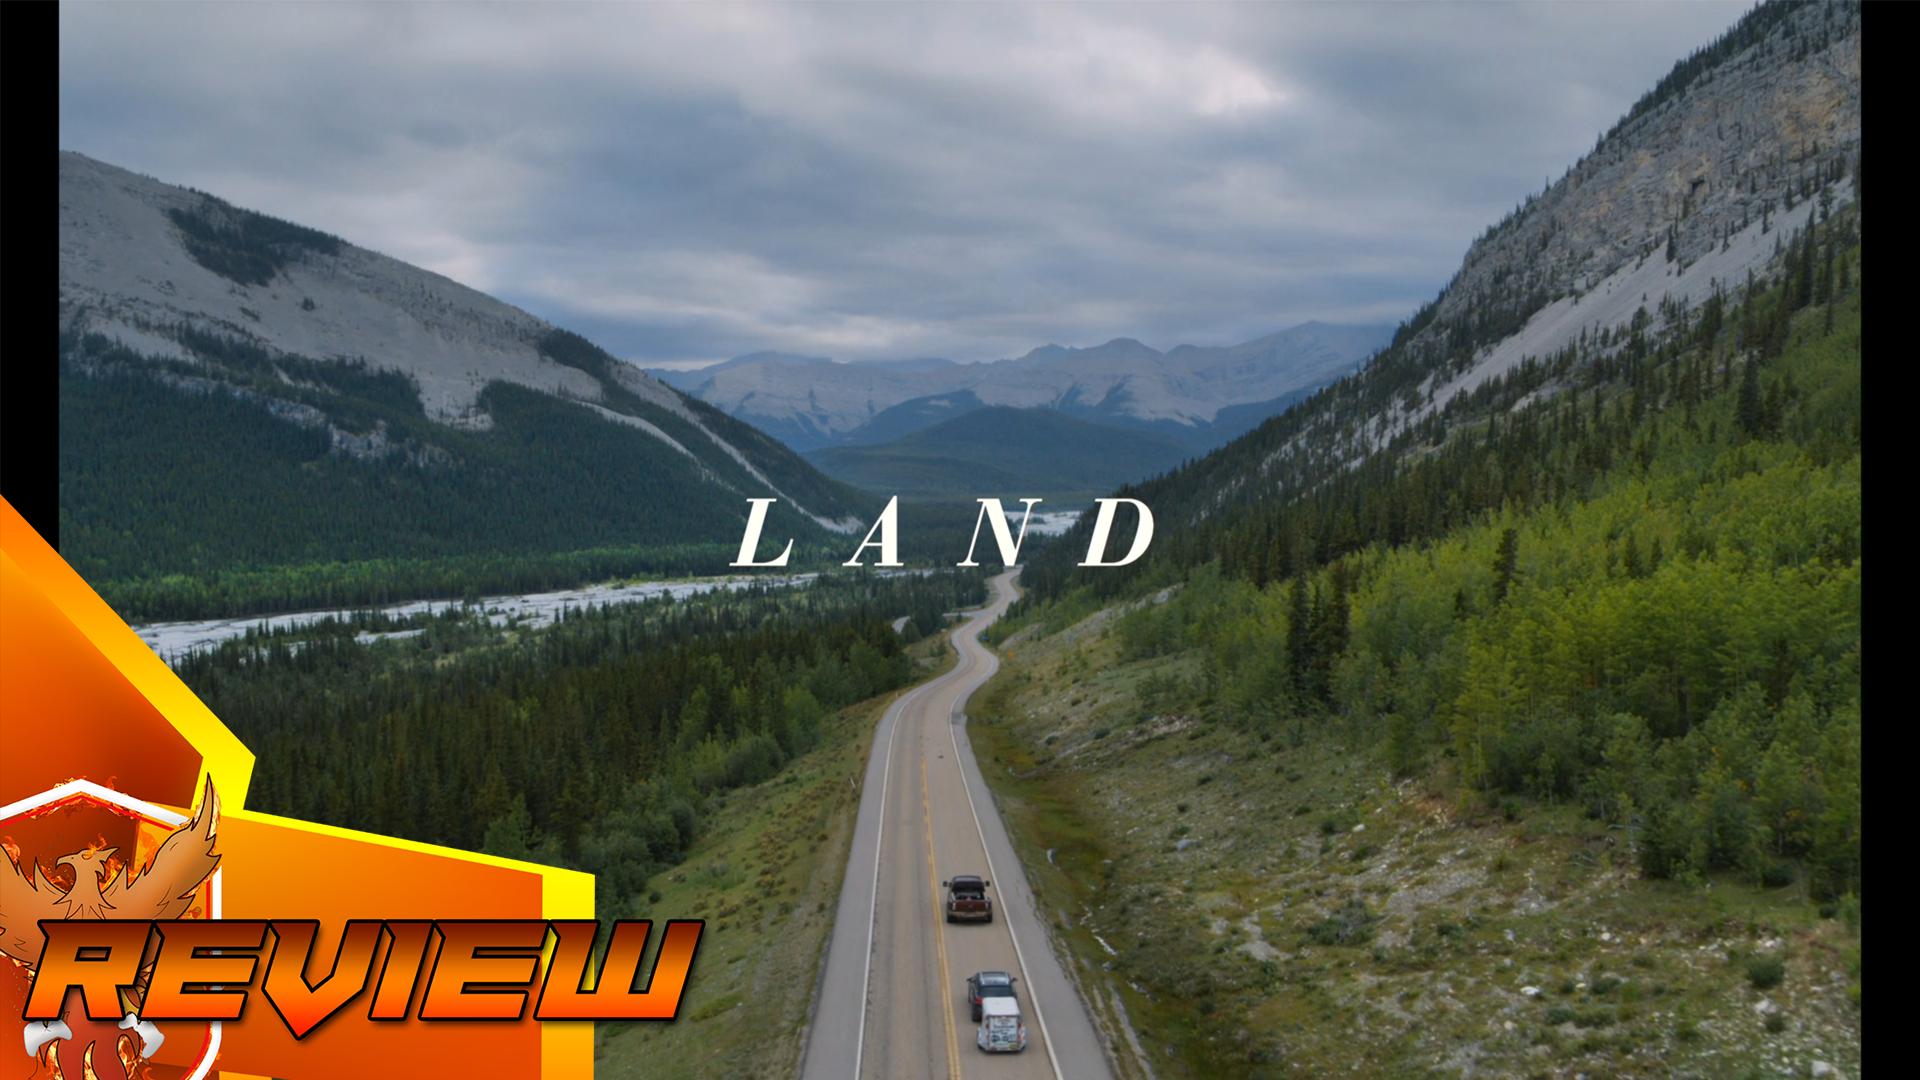 land intro image